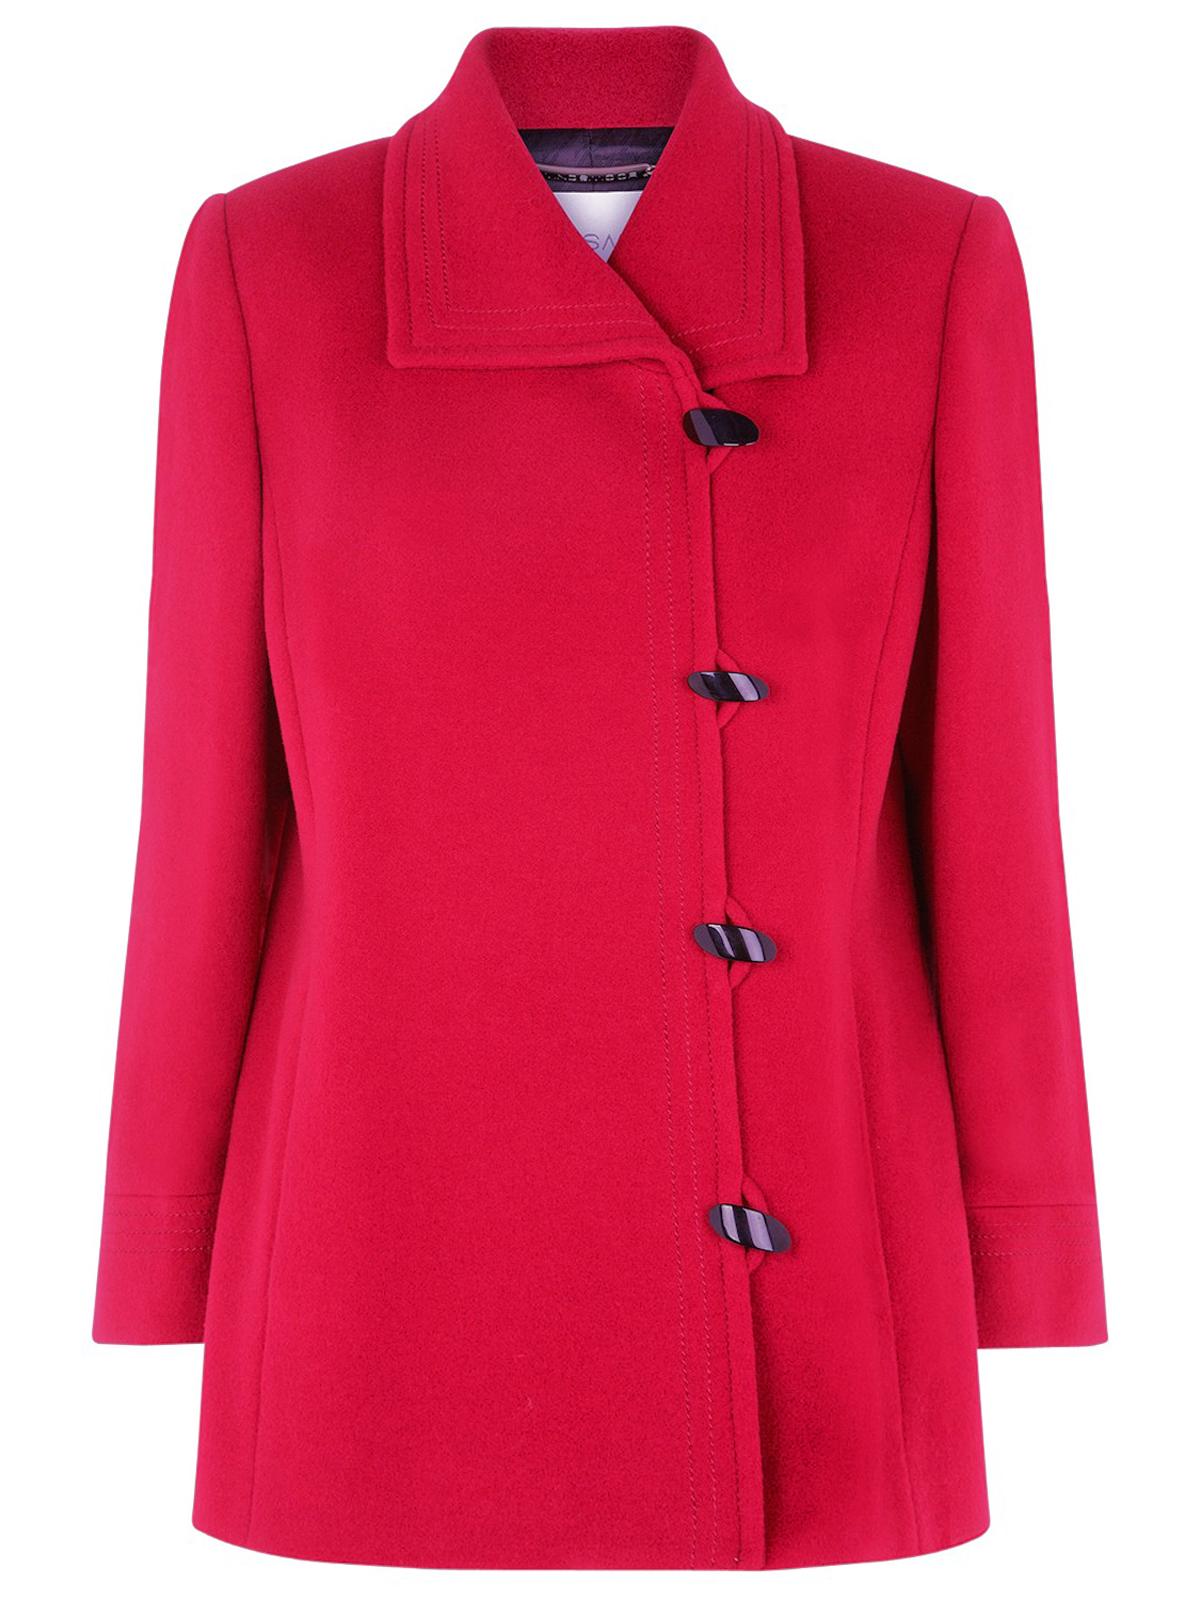 Windsmoor Womens Clothing Ebay